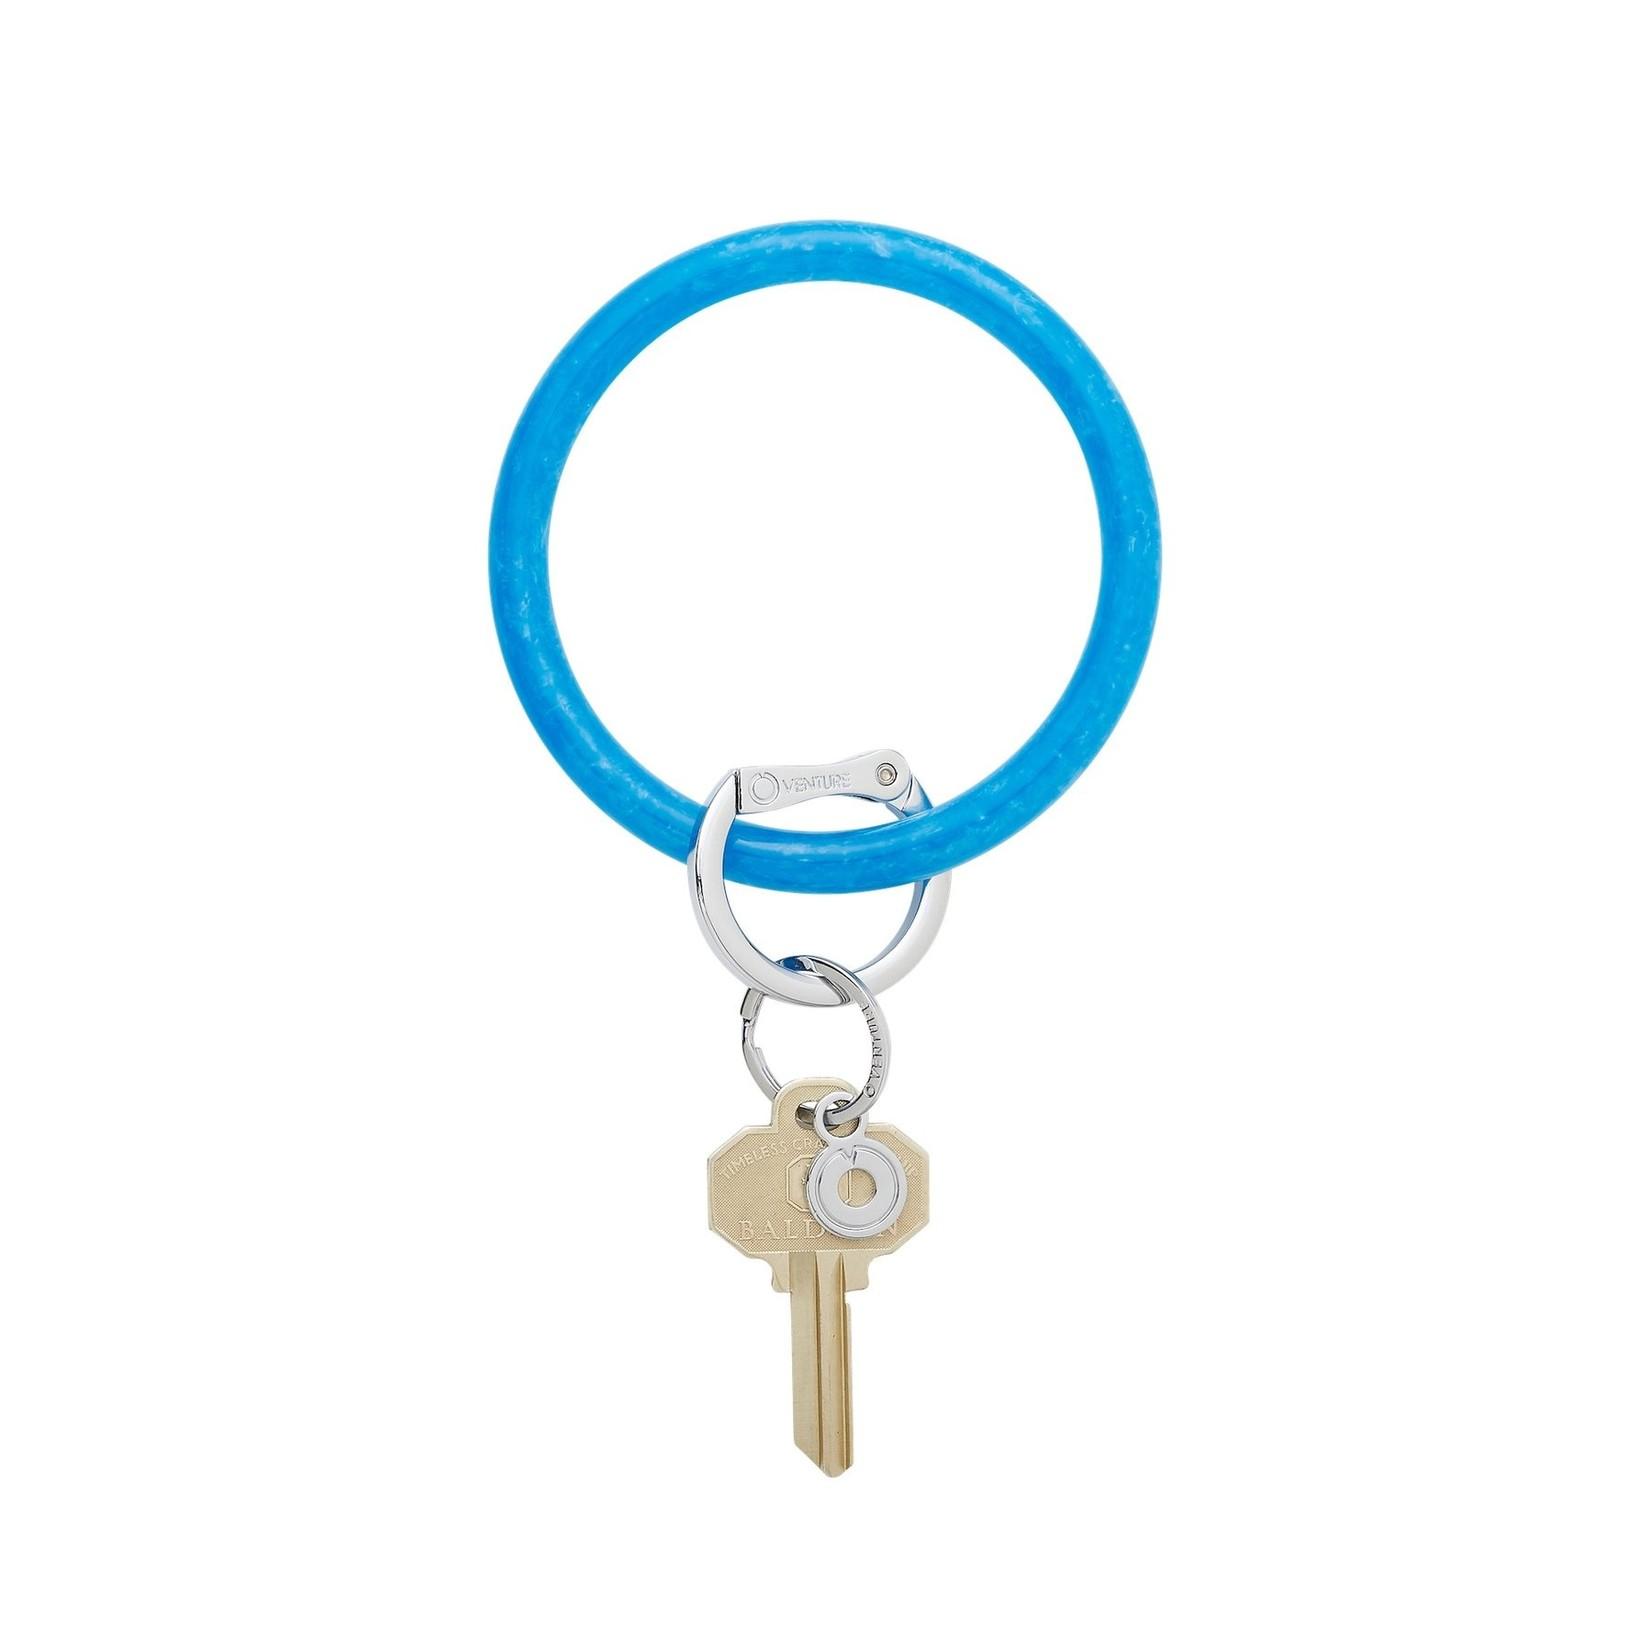 Oventure Resin Big O® Key Ring